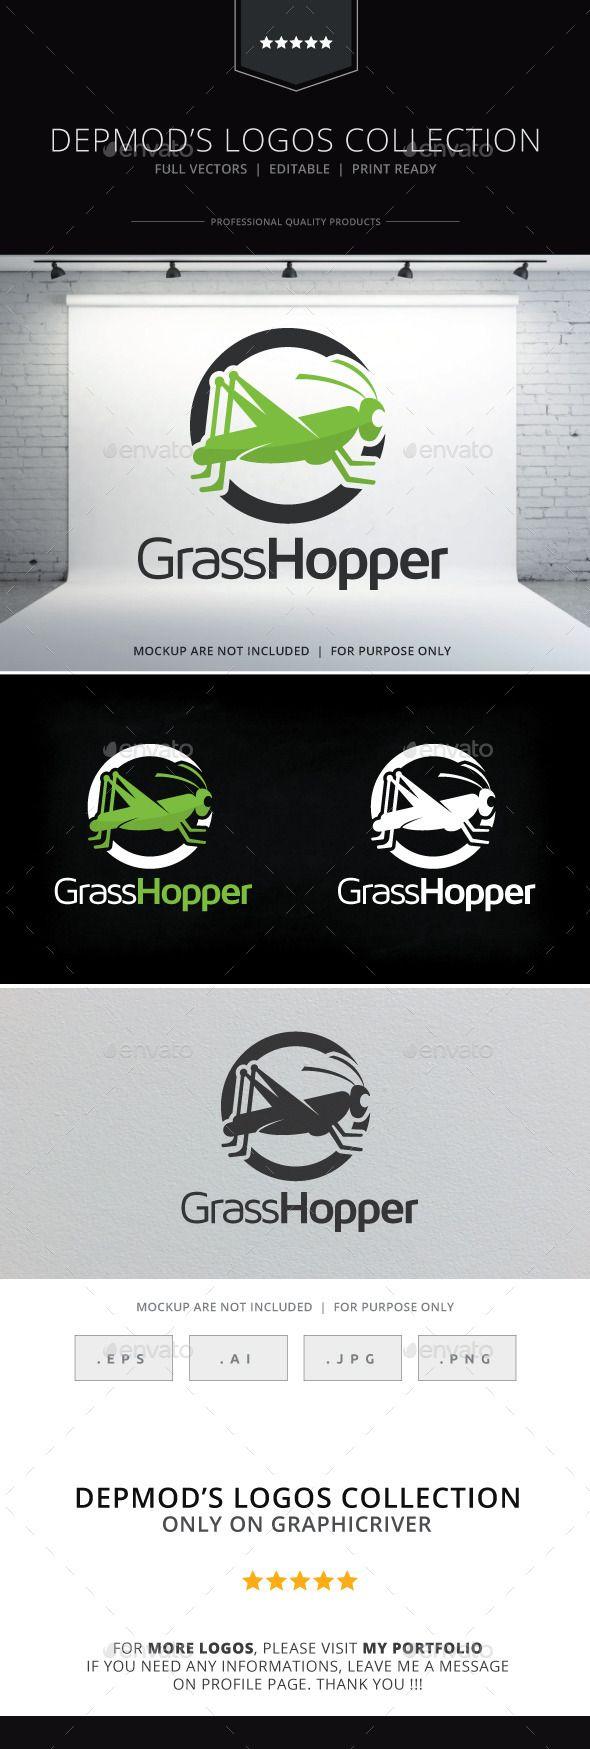 So much pileup vintage pro wrestling logos - Grasshopper Logo